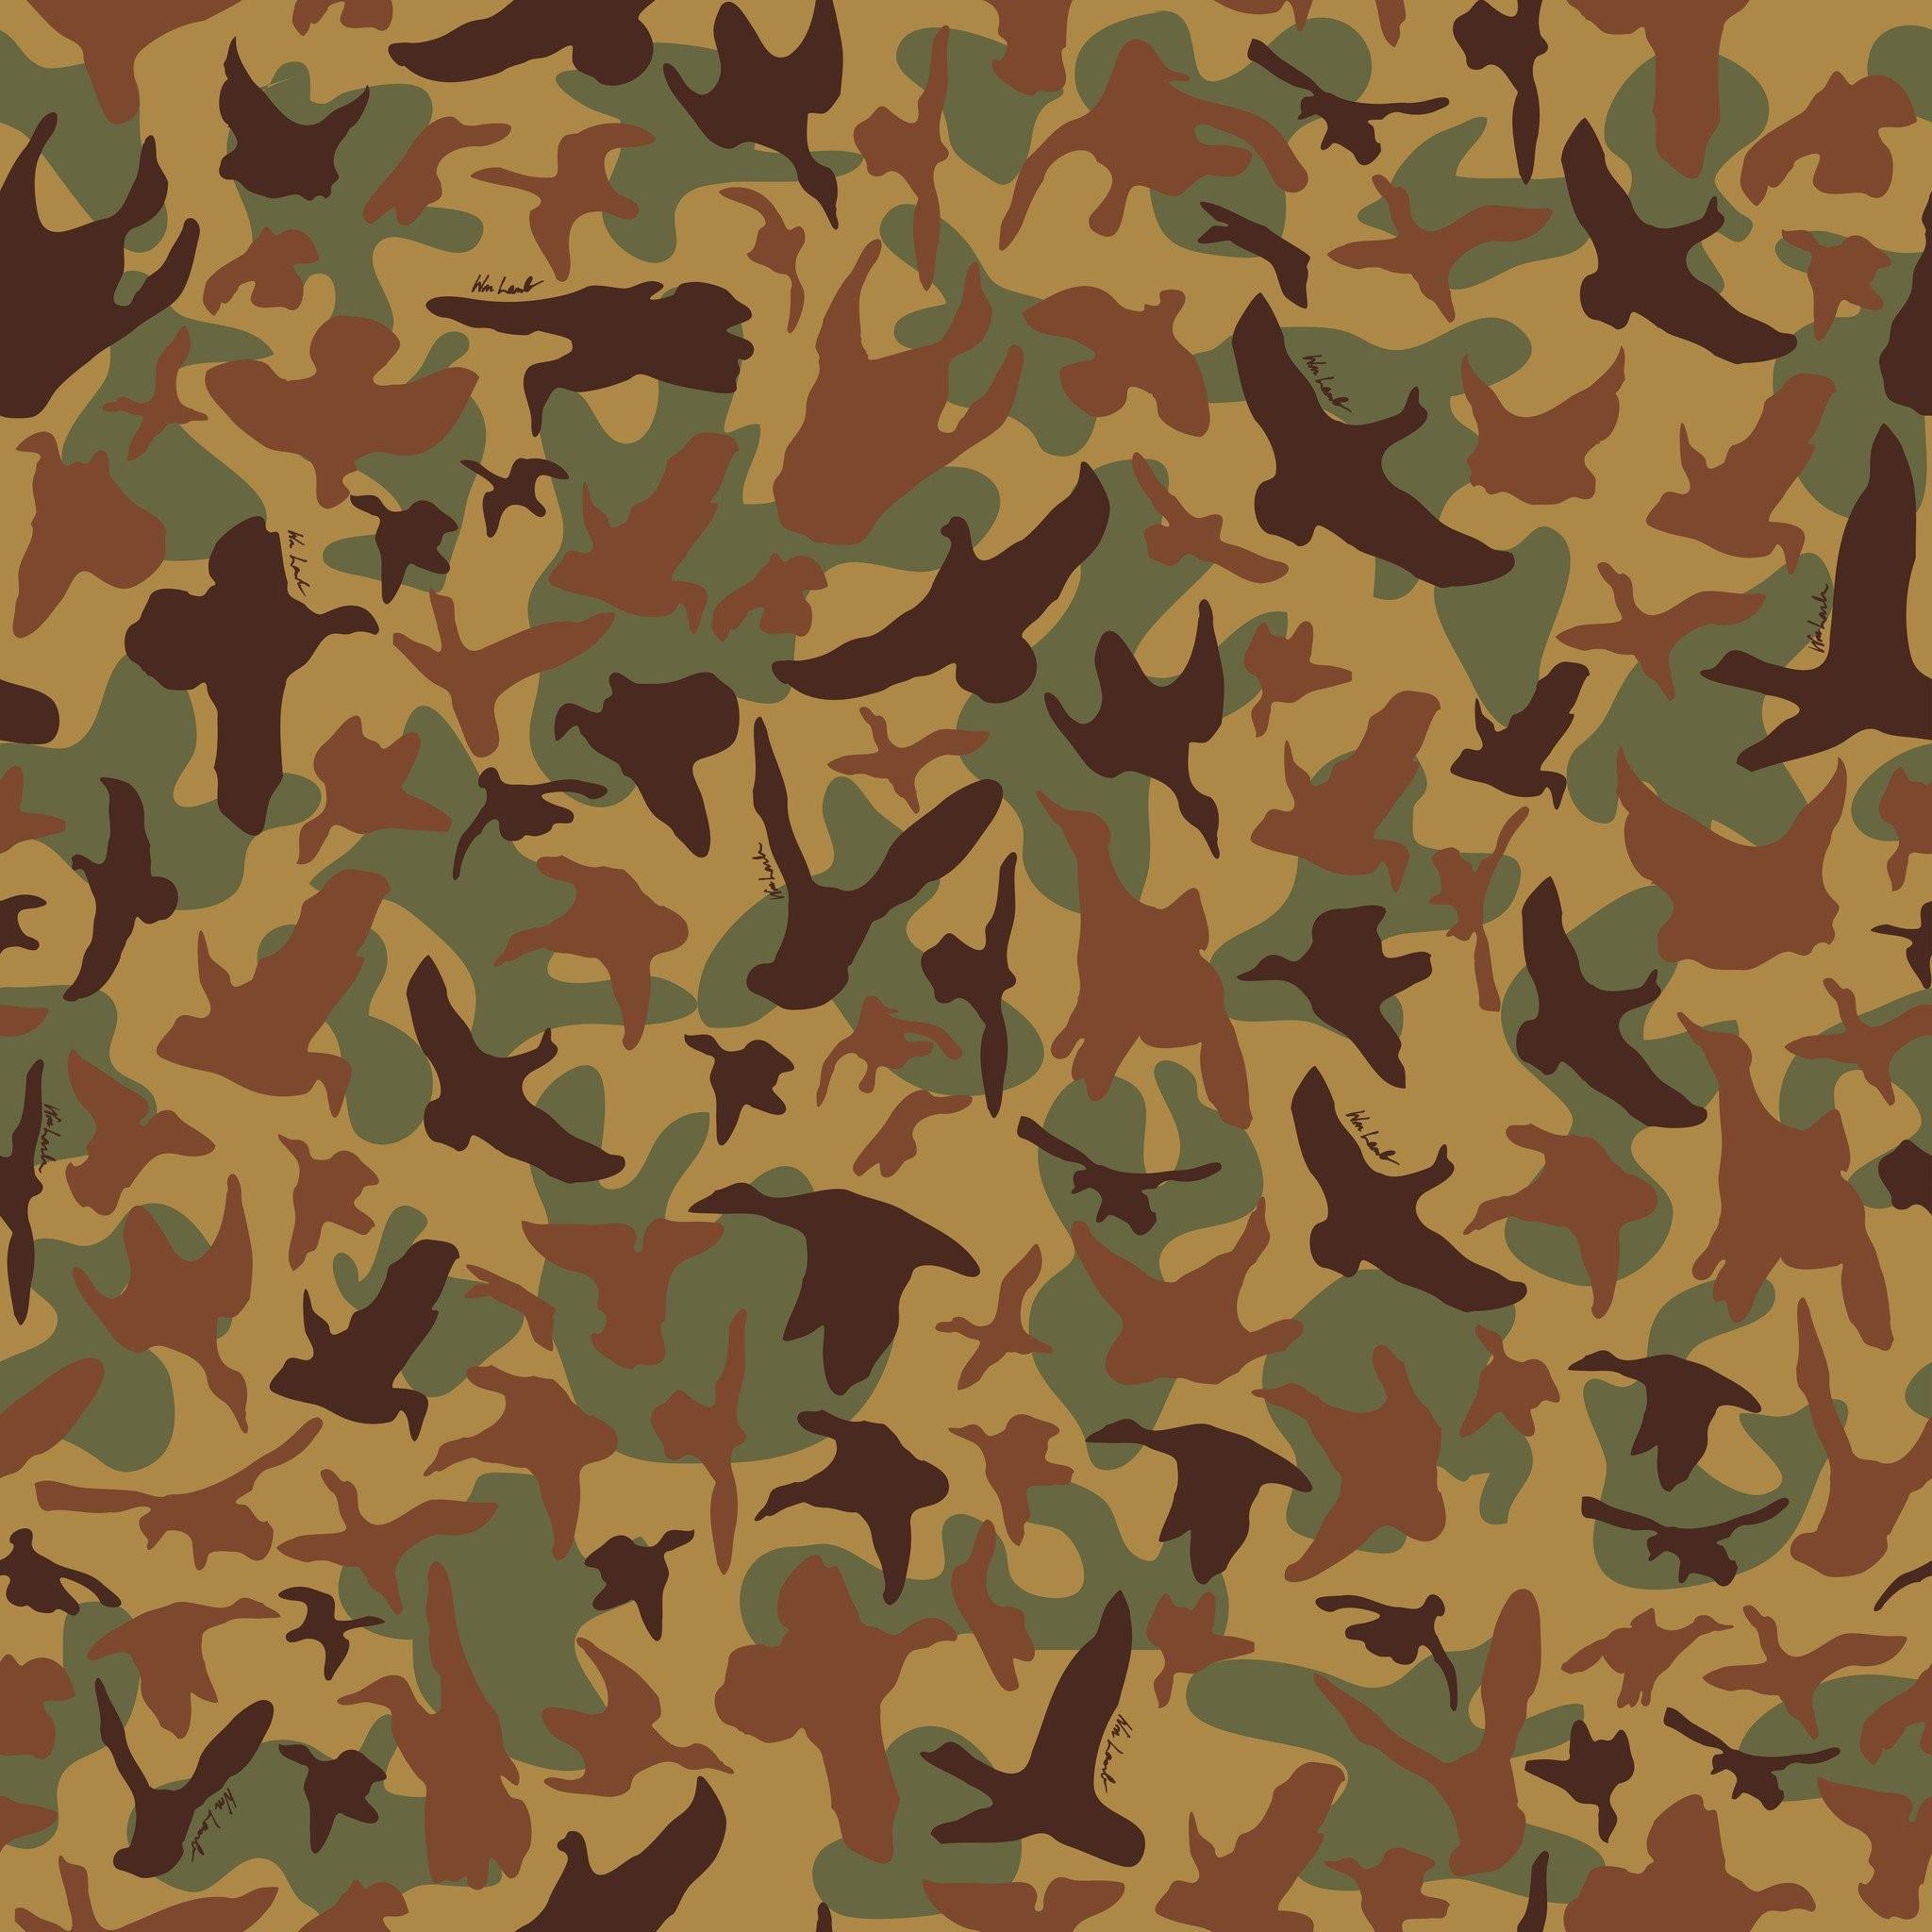 Hd Oregon Ducks Wallpaper Ducks Unlimited Desktop Wallpaper 51 Images